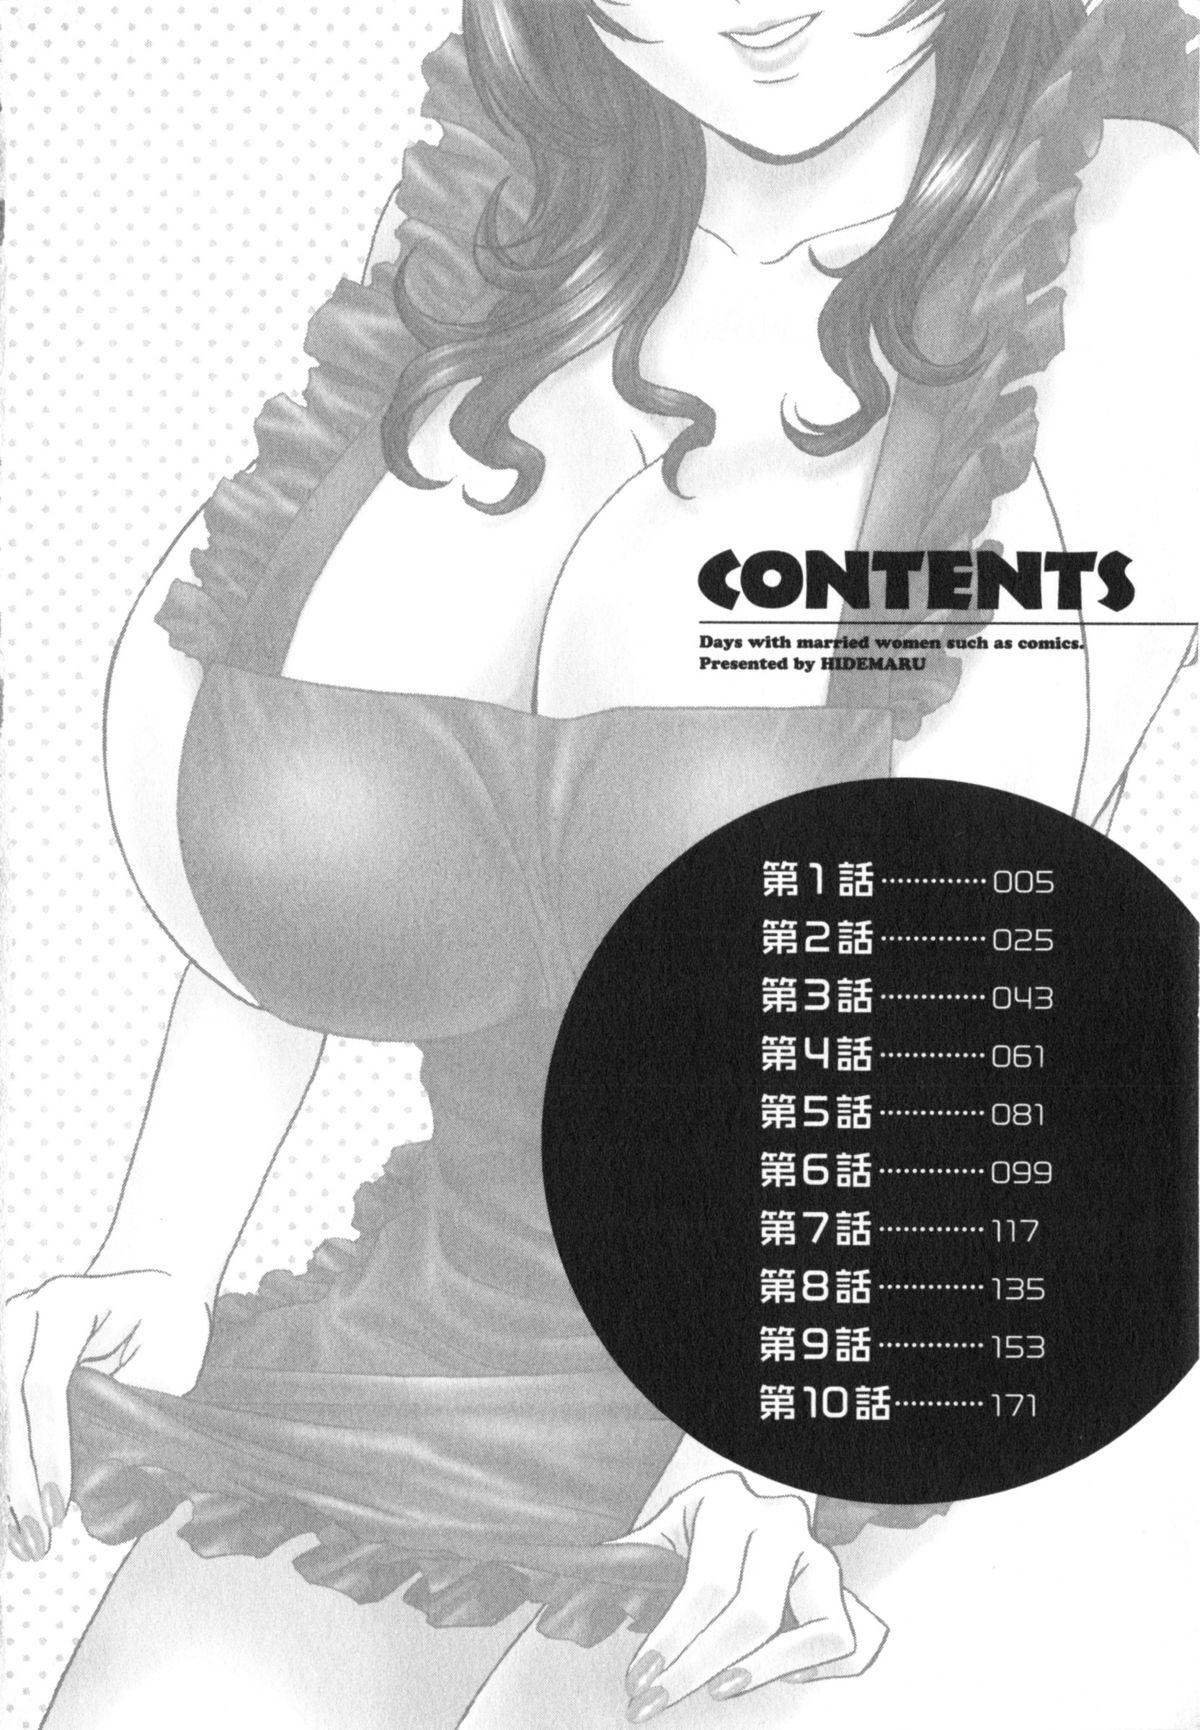 [Hidemaru] Life with Married Women Just Like a Manga 1 - Ch. 1-3 [English] {Tadanohito} 4